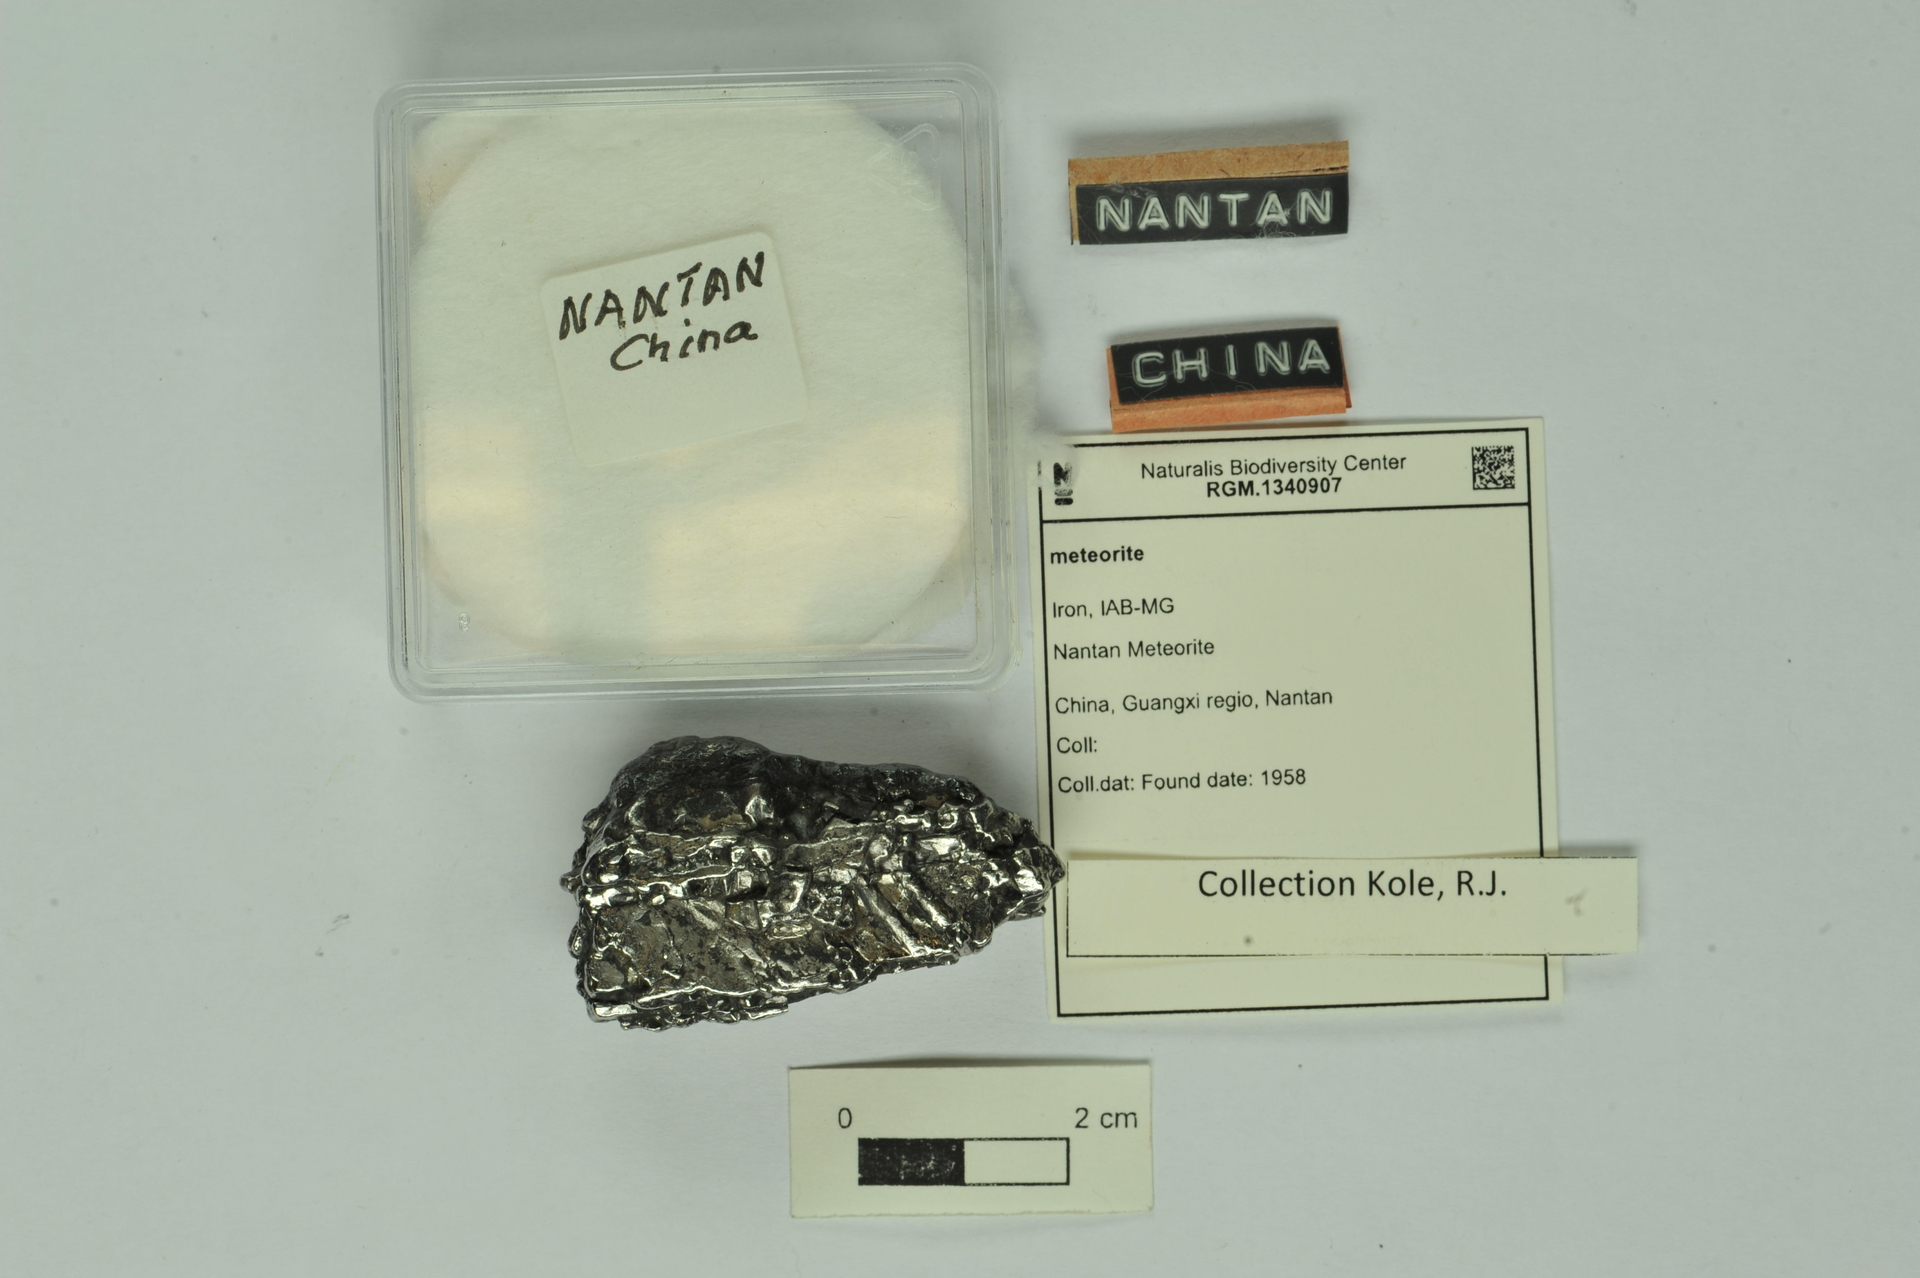 RGM.1340907 | Iron, IAB-MG